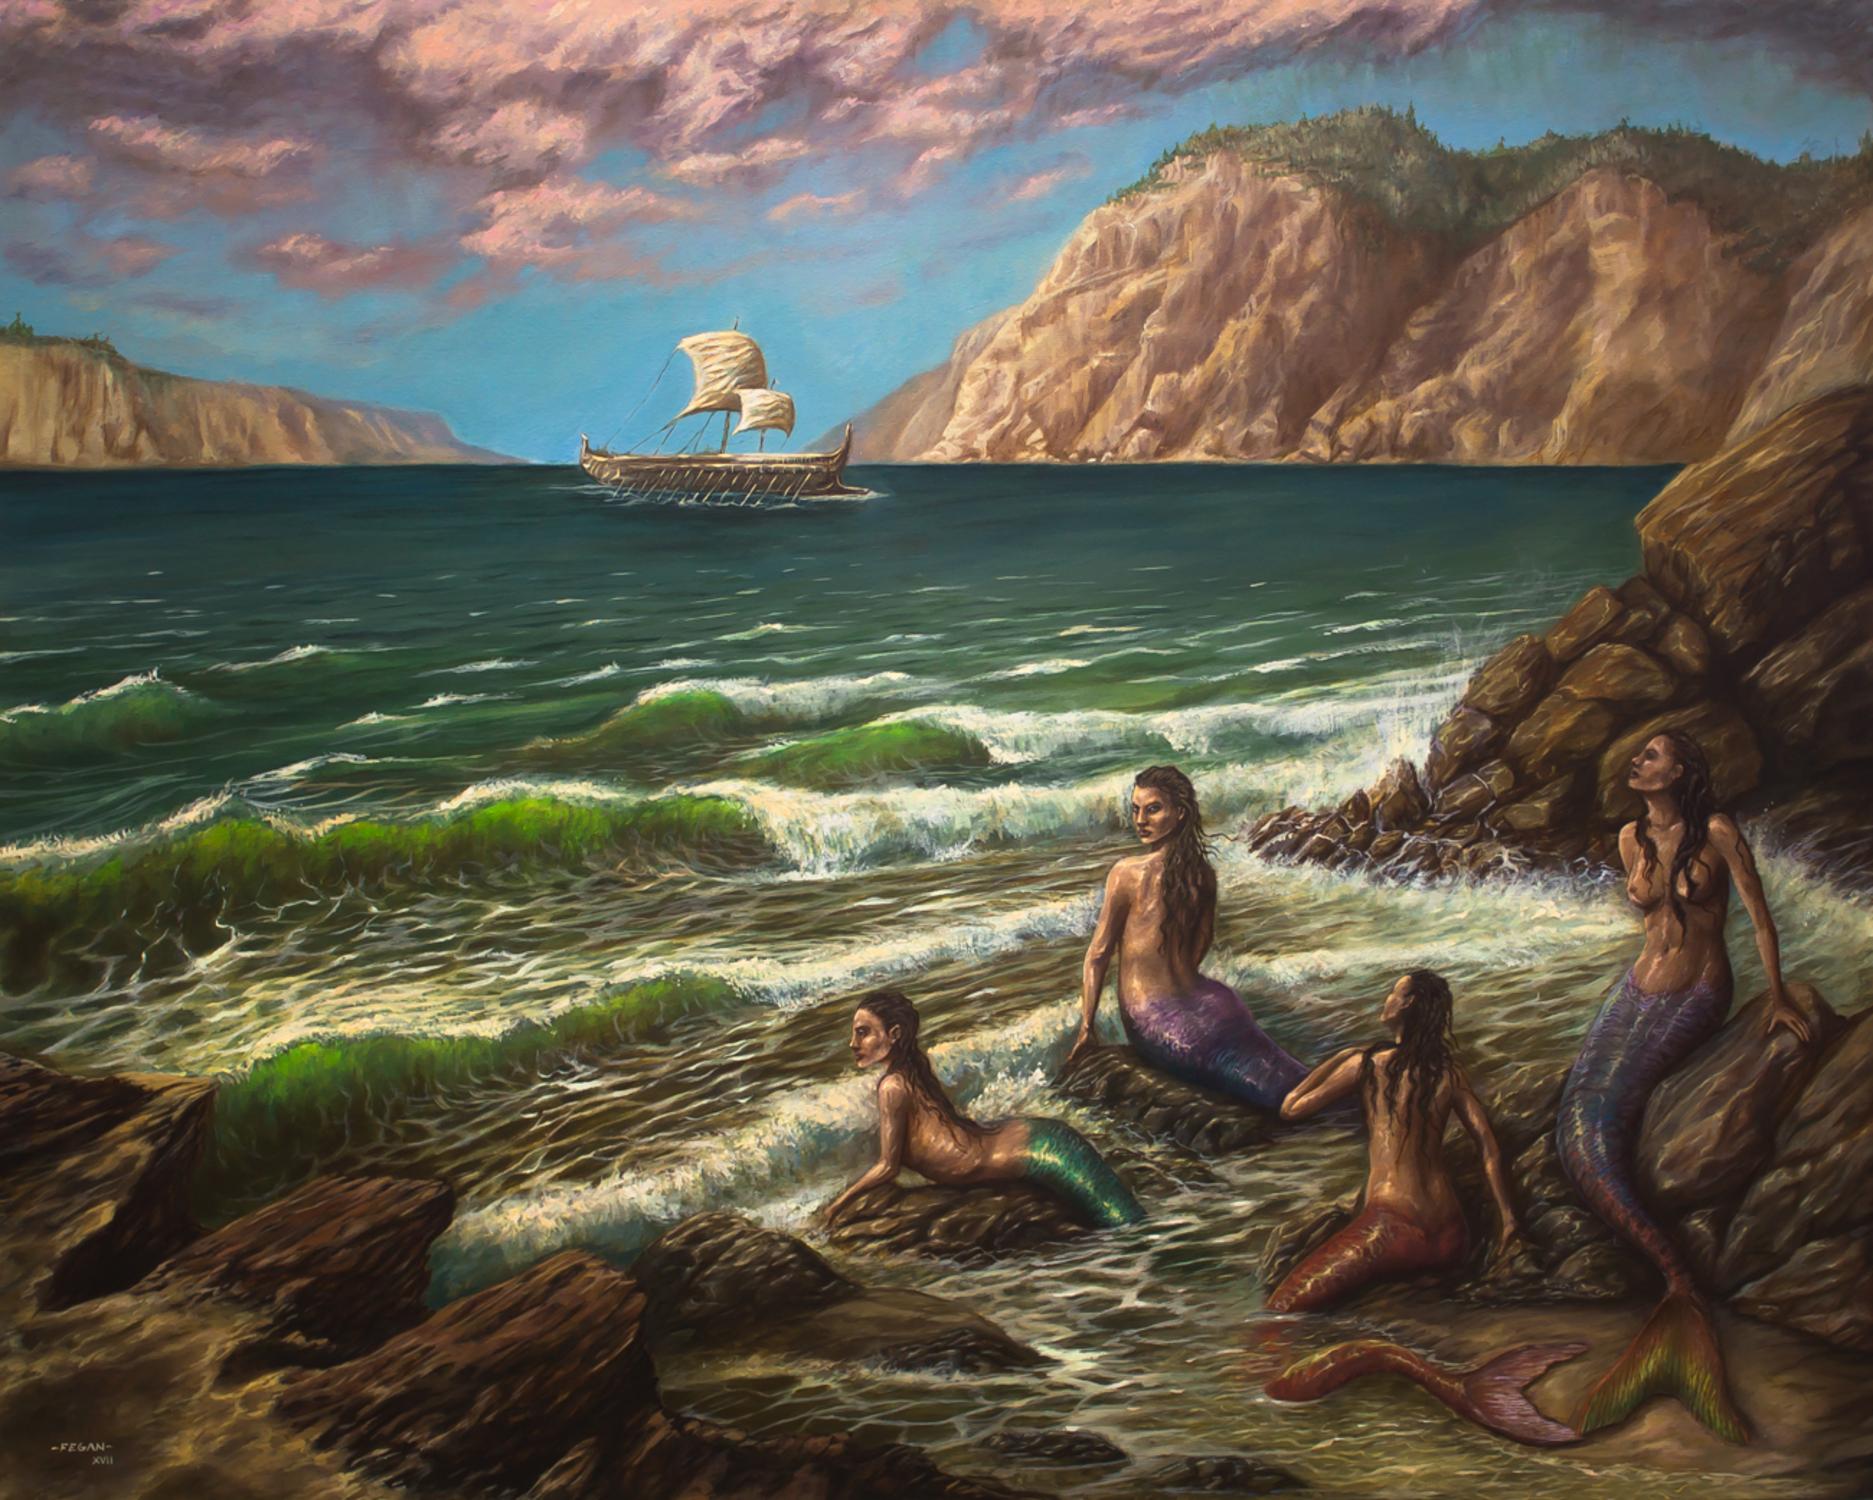 Mermaids Artwork by Mario  Fegan